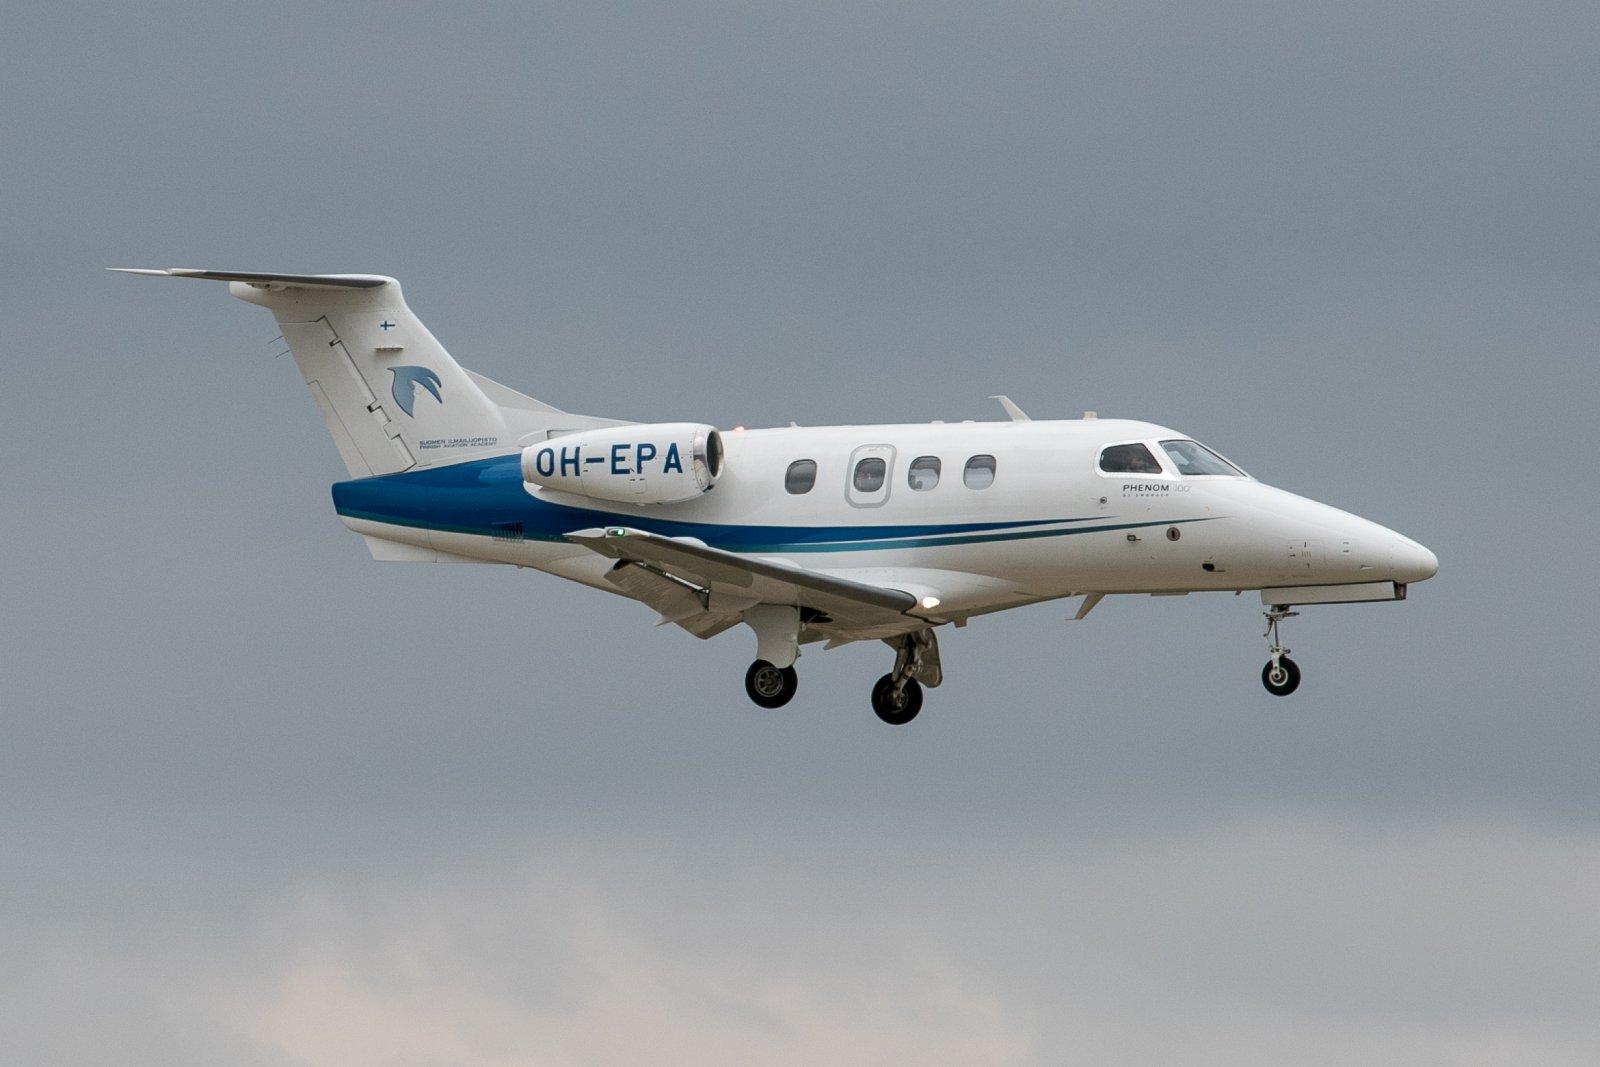 OH-EPA. Embraer Phenom 100. 17.7.2019